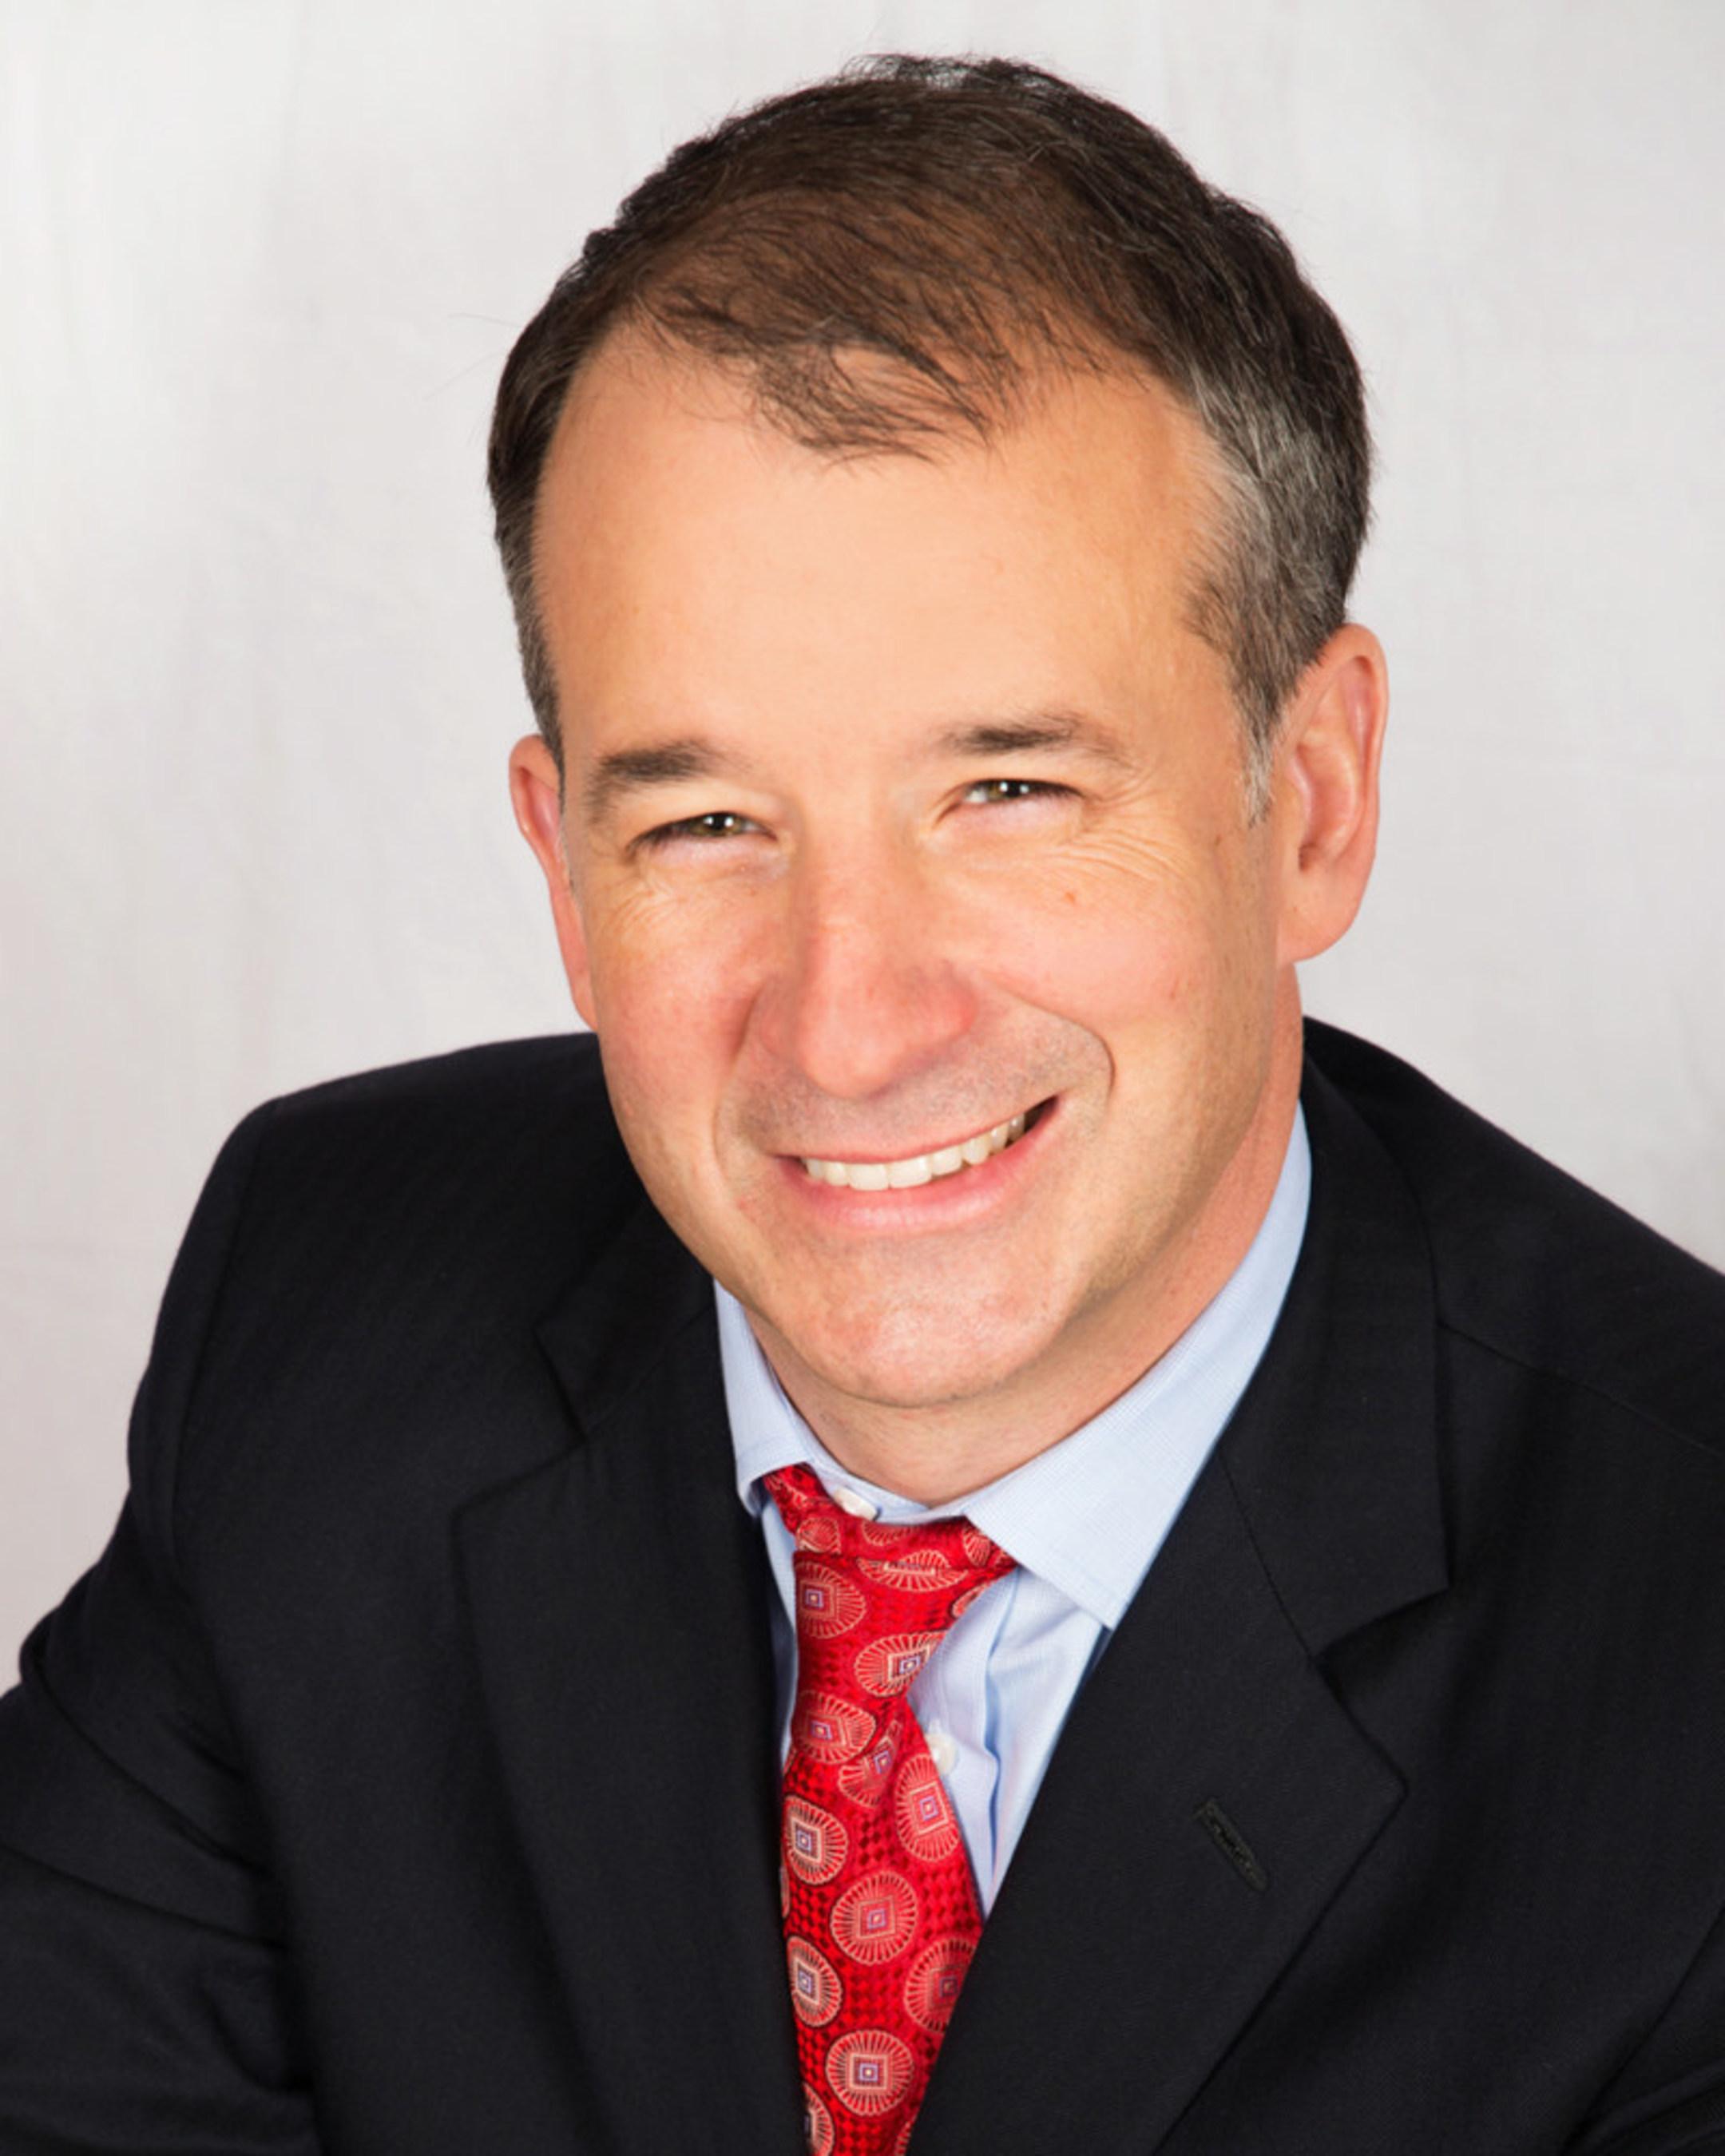 David Tolson, CEO, DBT-DATA